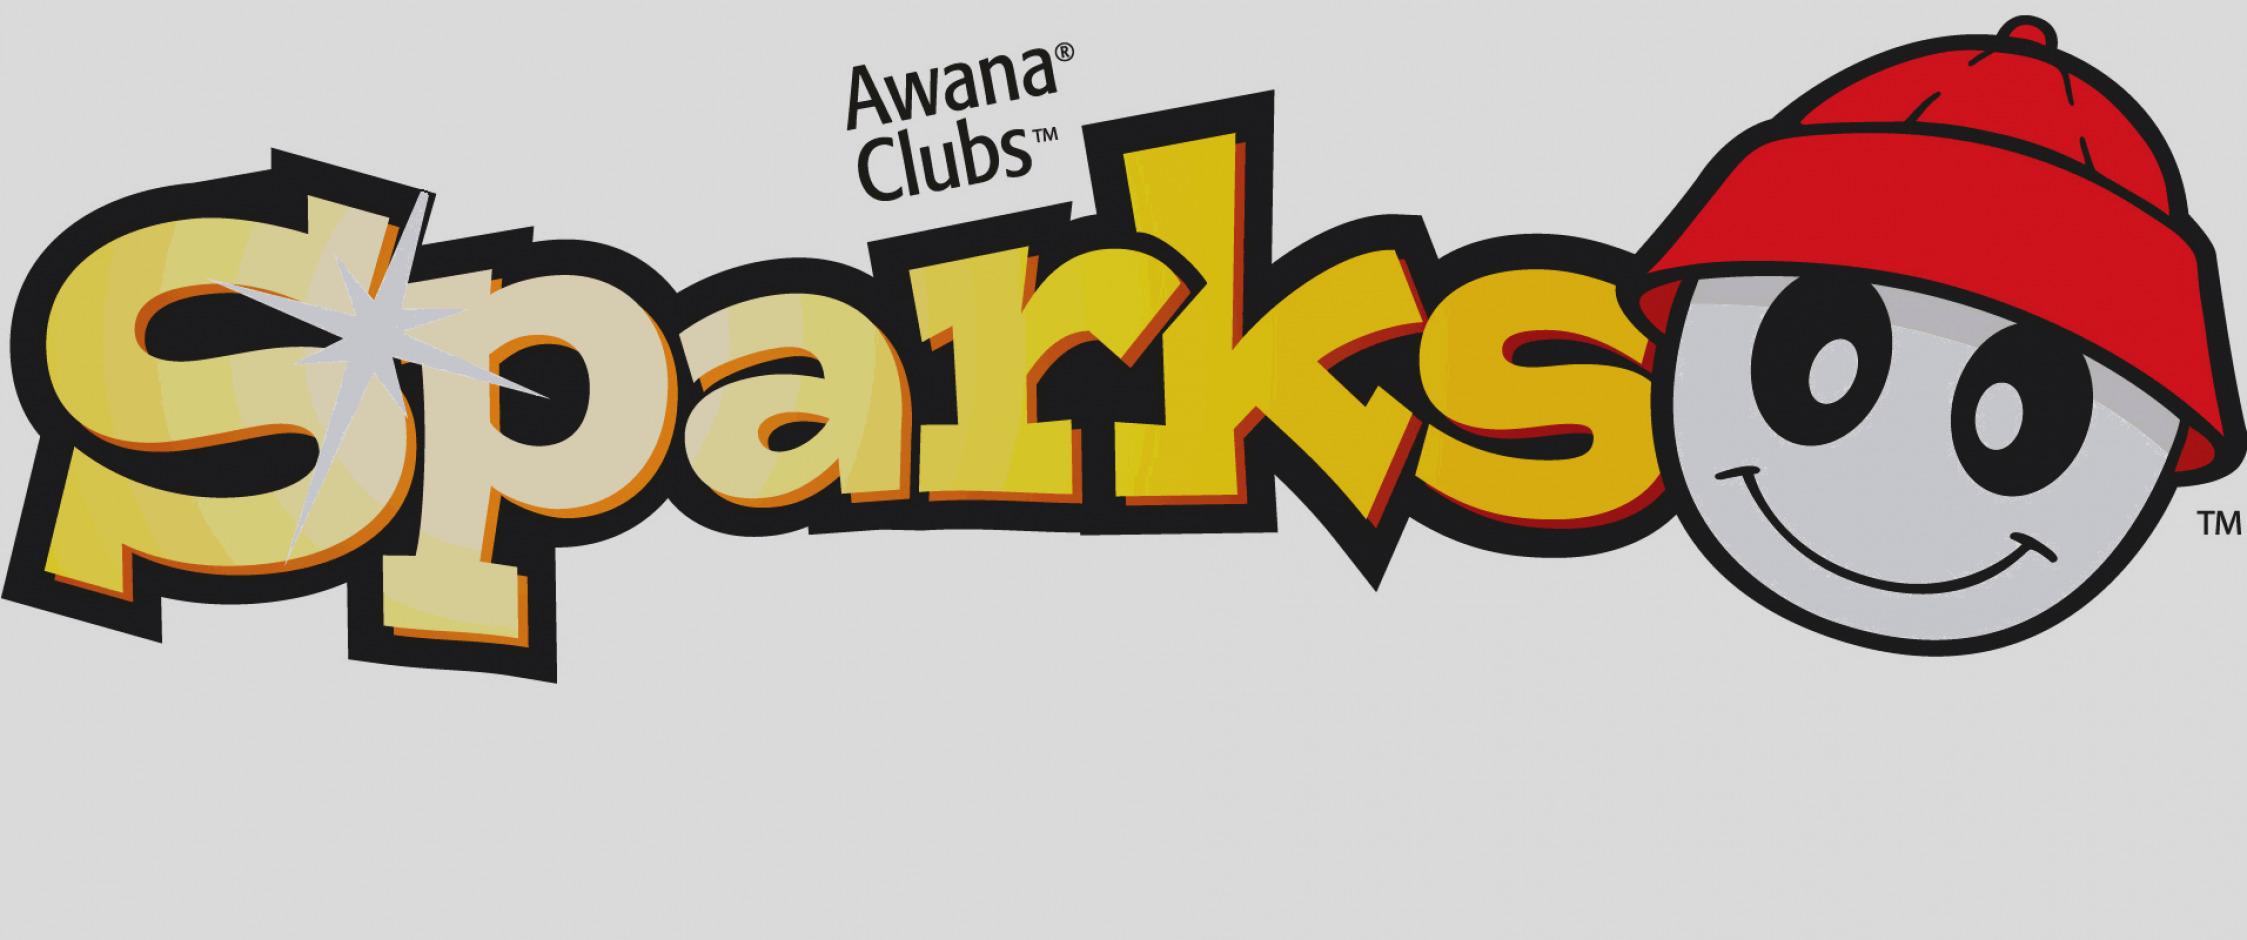 Awana clipart logo. Pictures clip art free